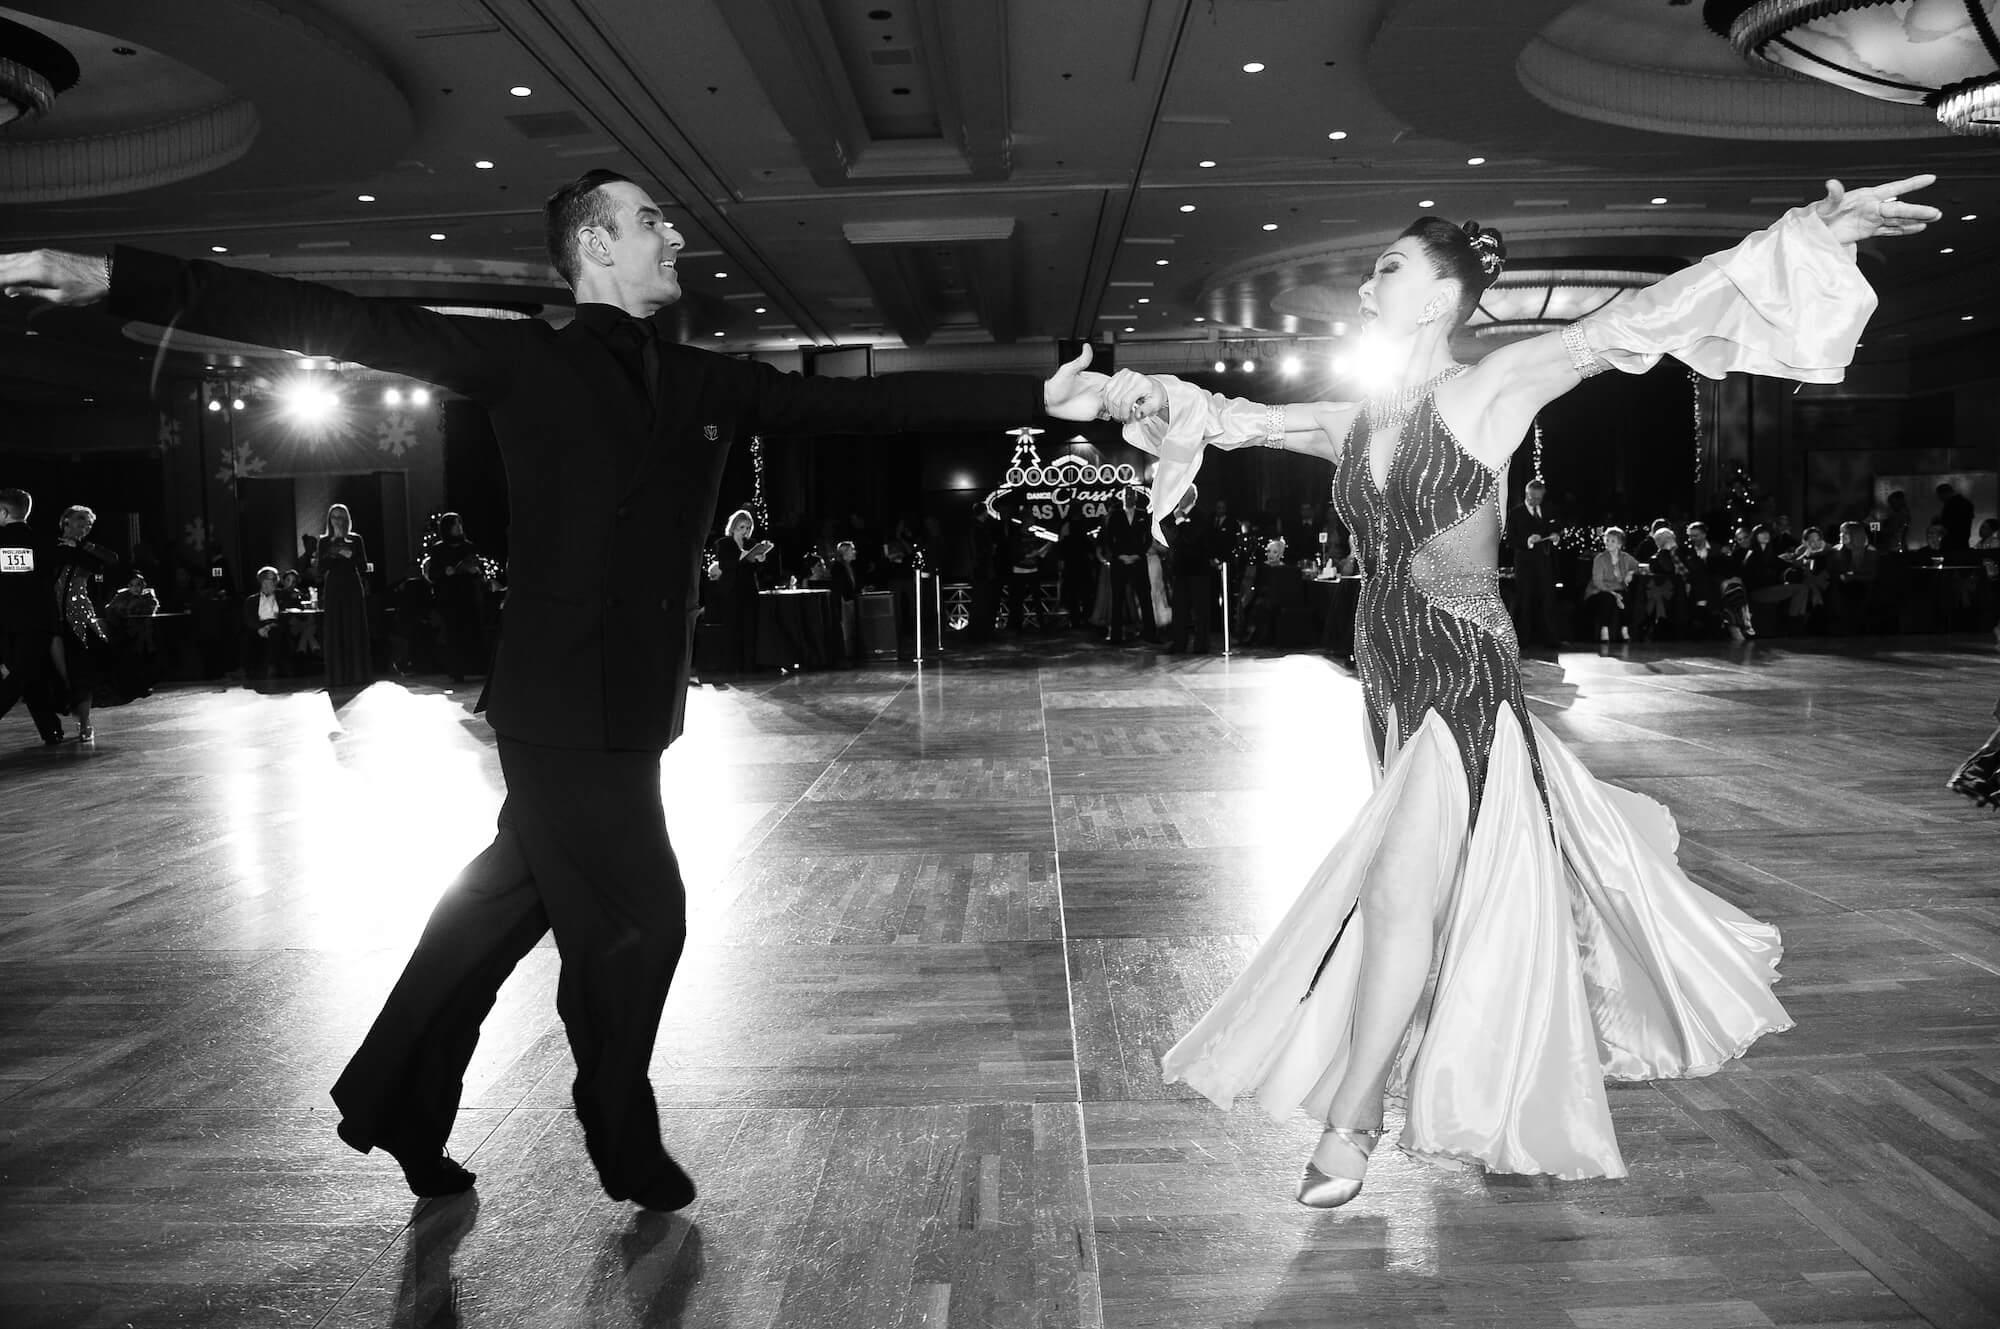 Atanas Malamov dances american smooth at holiday dance classic